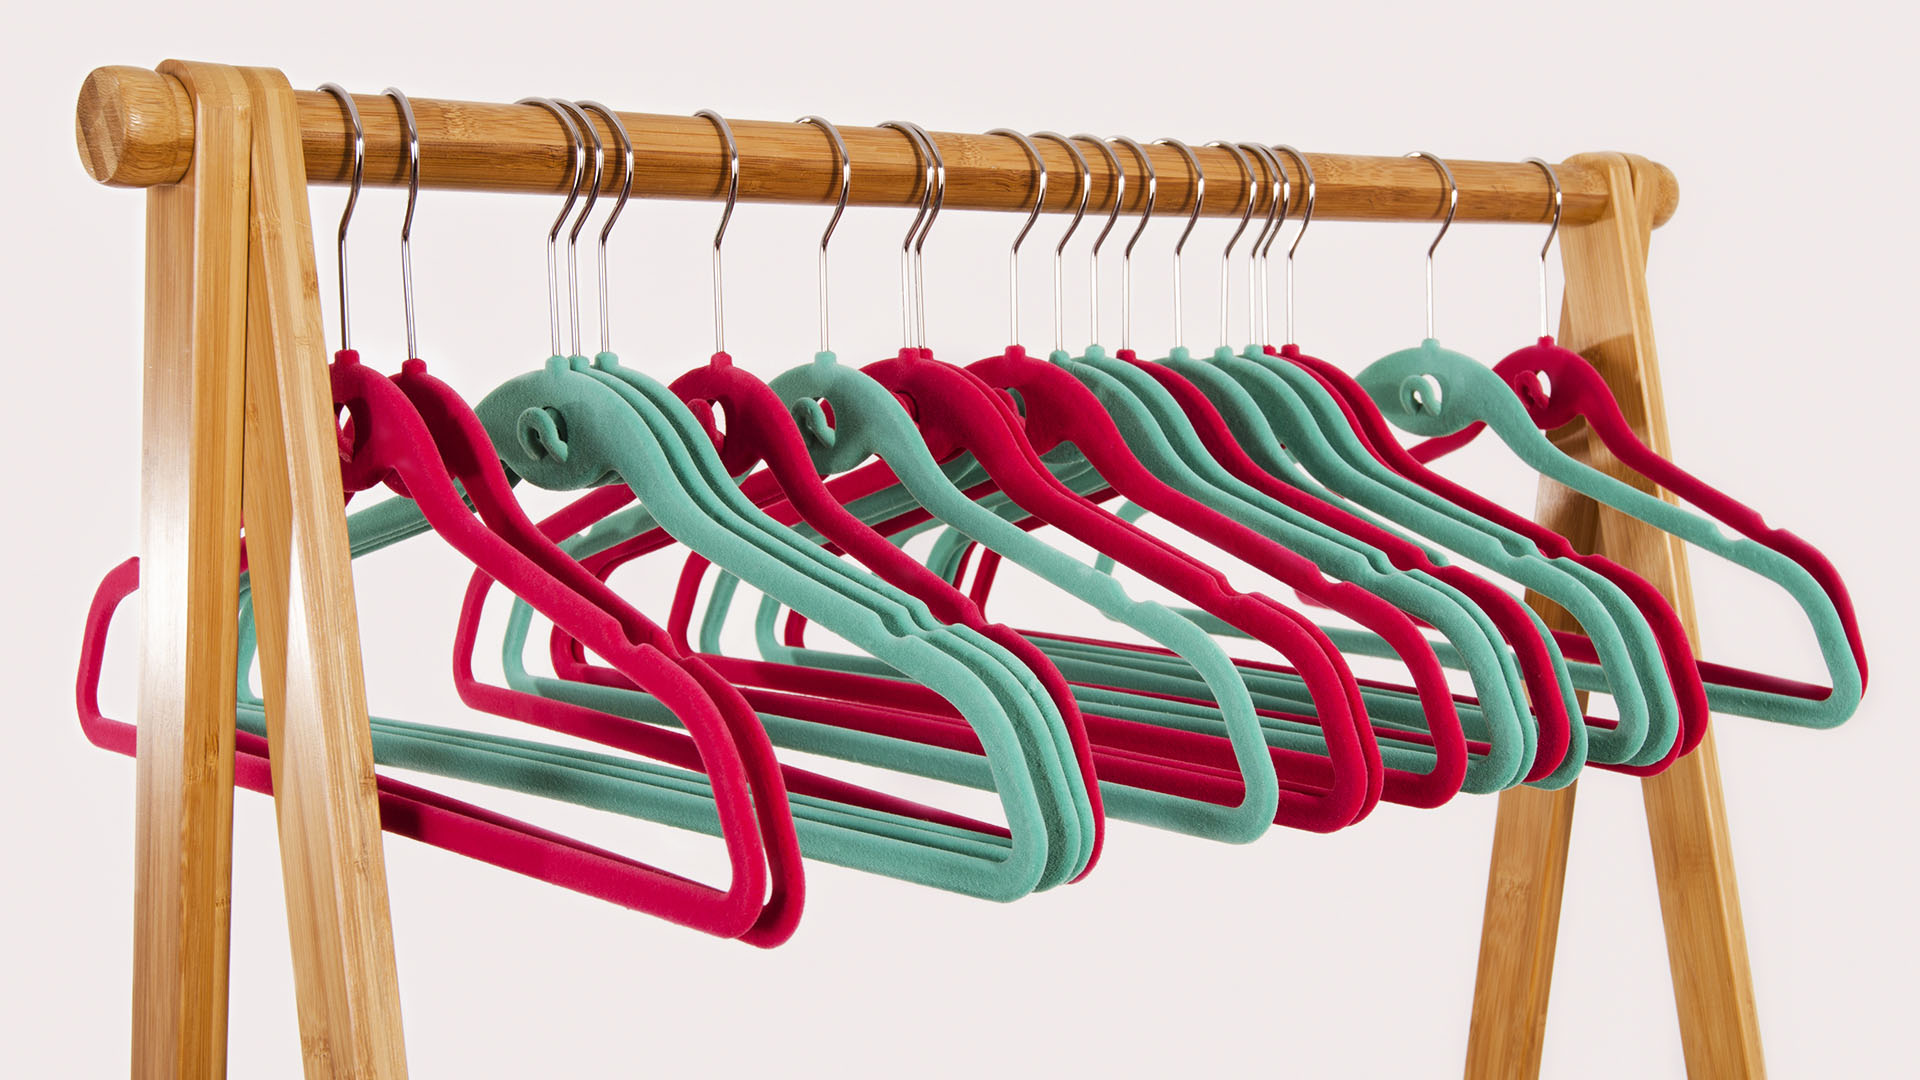 The best hangers are Joy Mangano felt hangers - TODAY.com